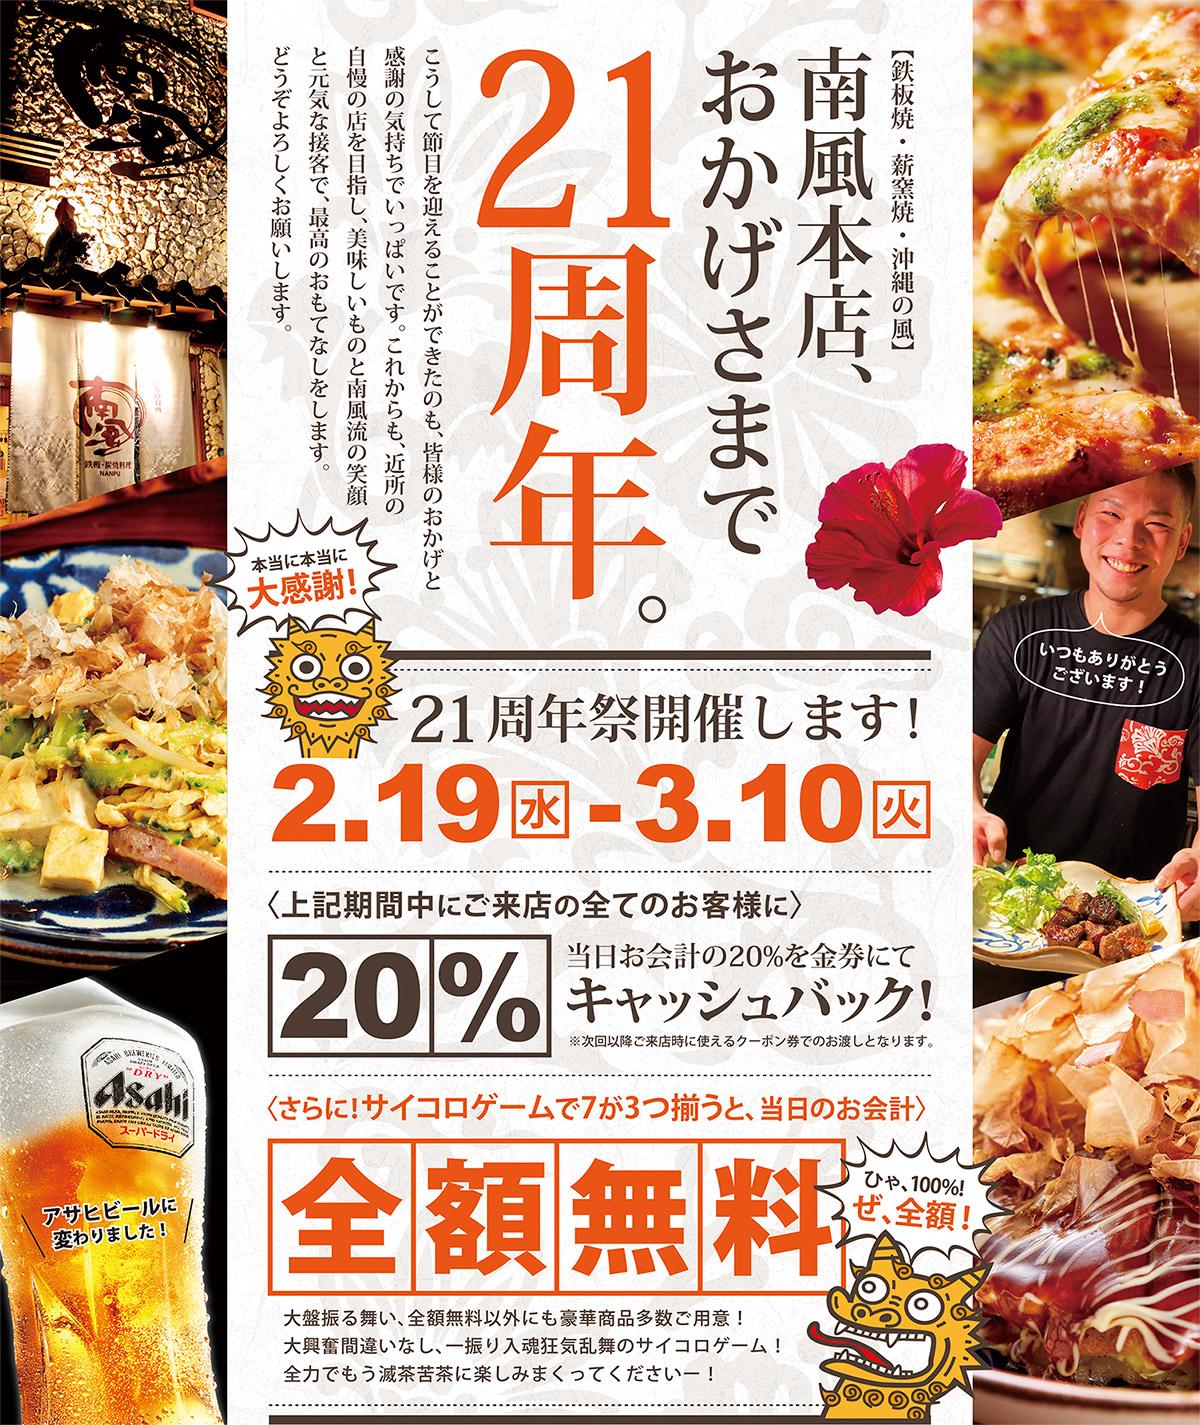 南風本店『大感謝の21周年祭』